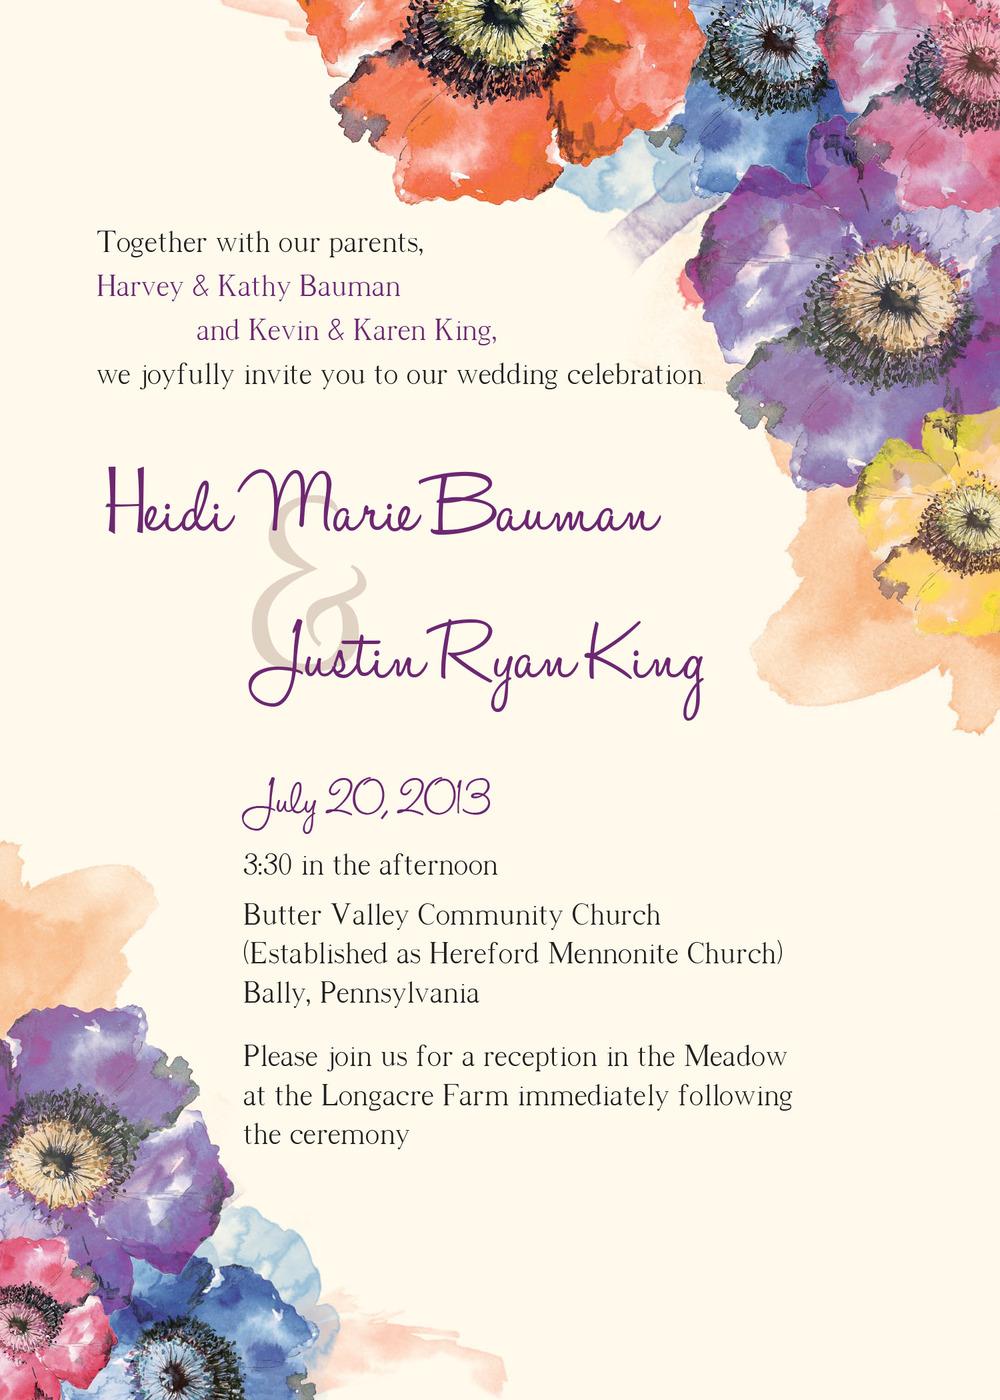 HJ_invite.jpg